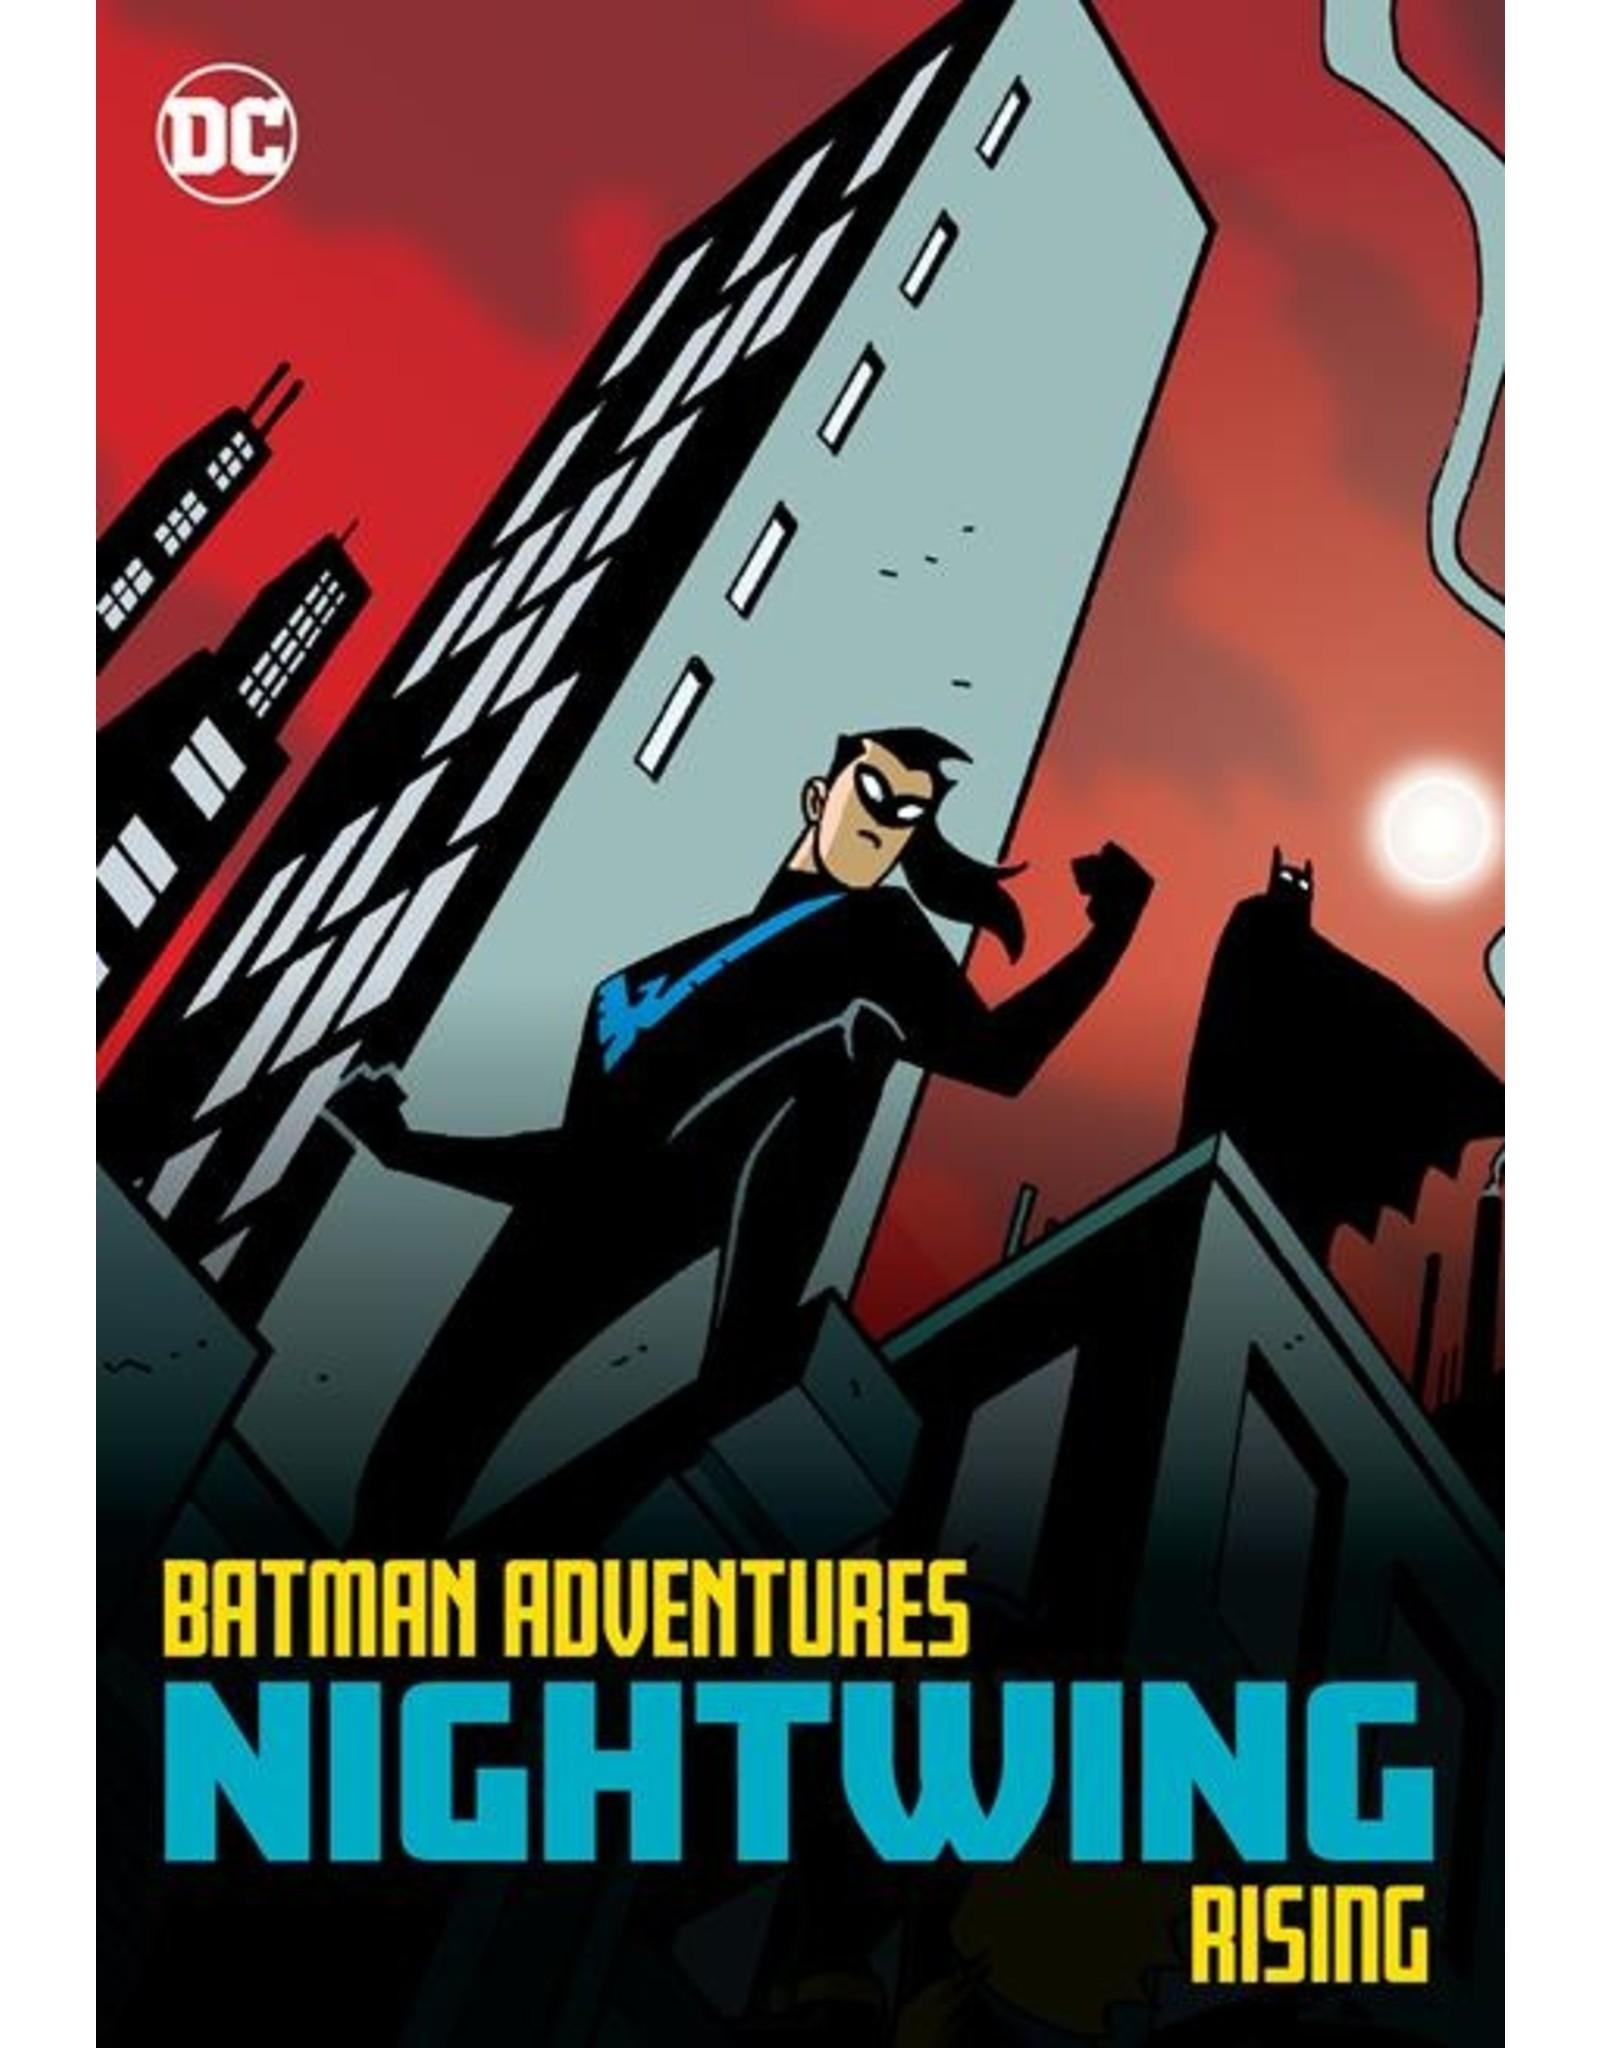 DC COMICS BATMAN ADVENTURES NIGHTWING RISING TP